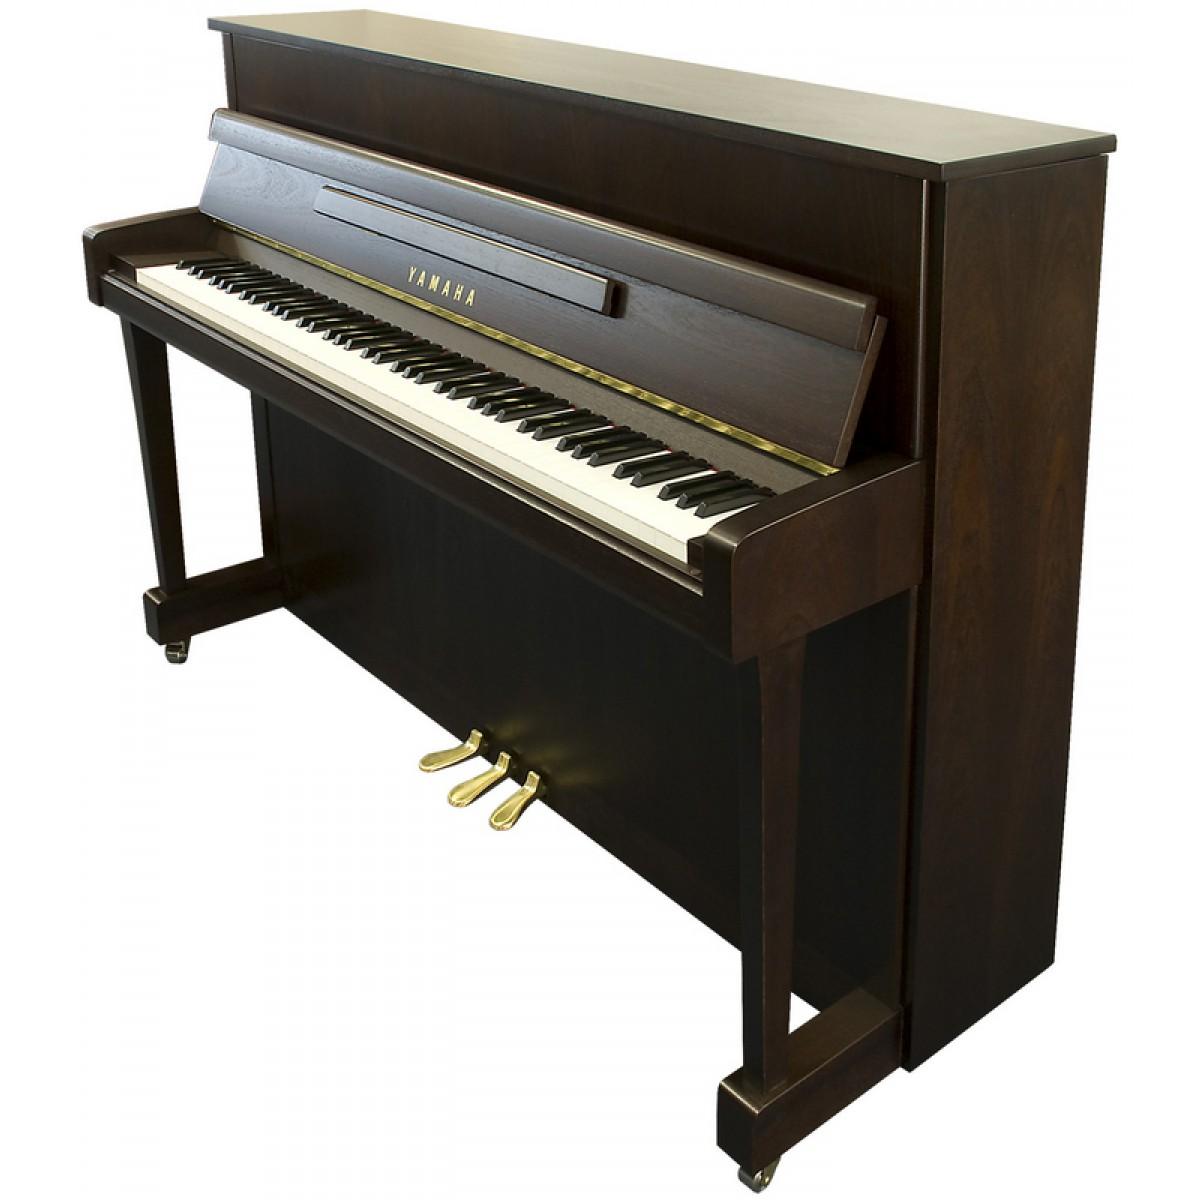 yamaha-b2-klavier-nussbaum-holz